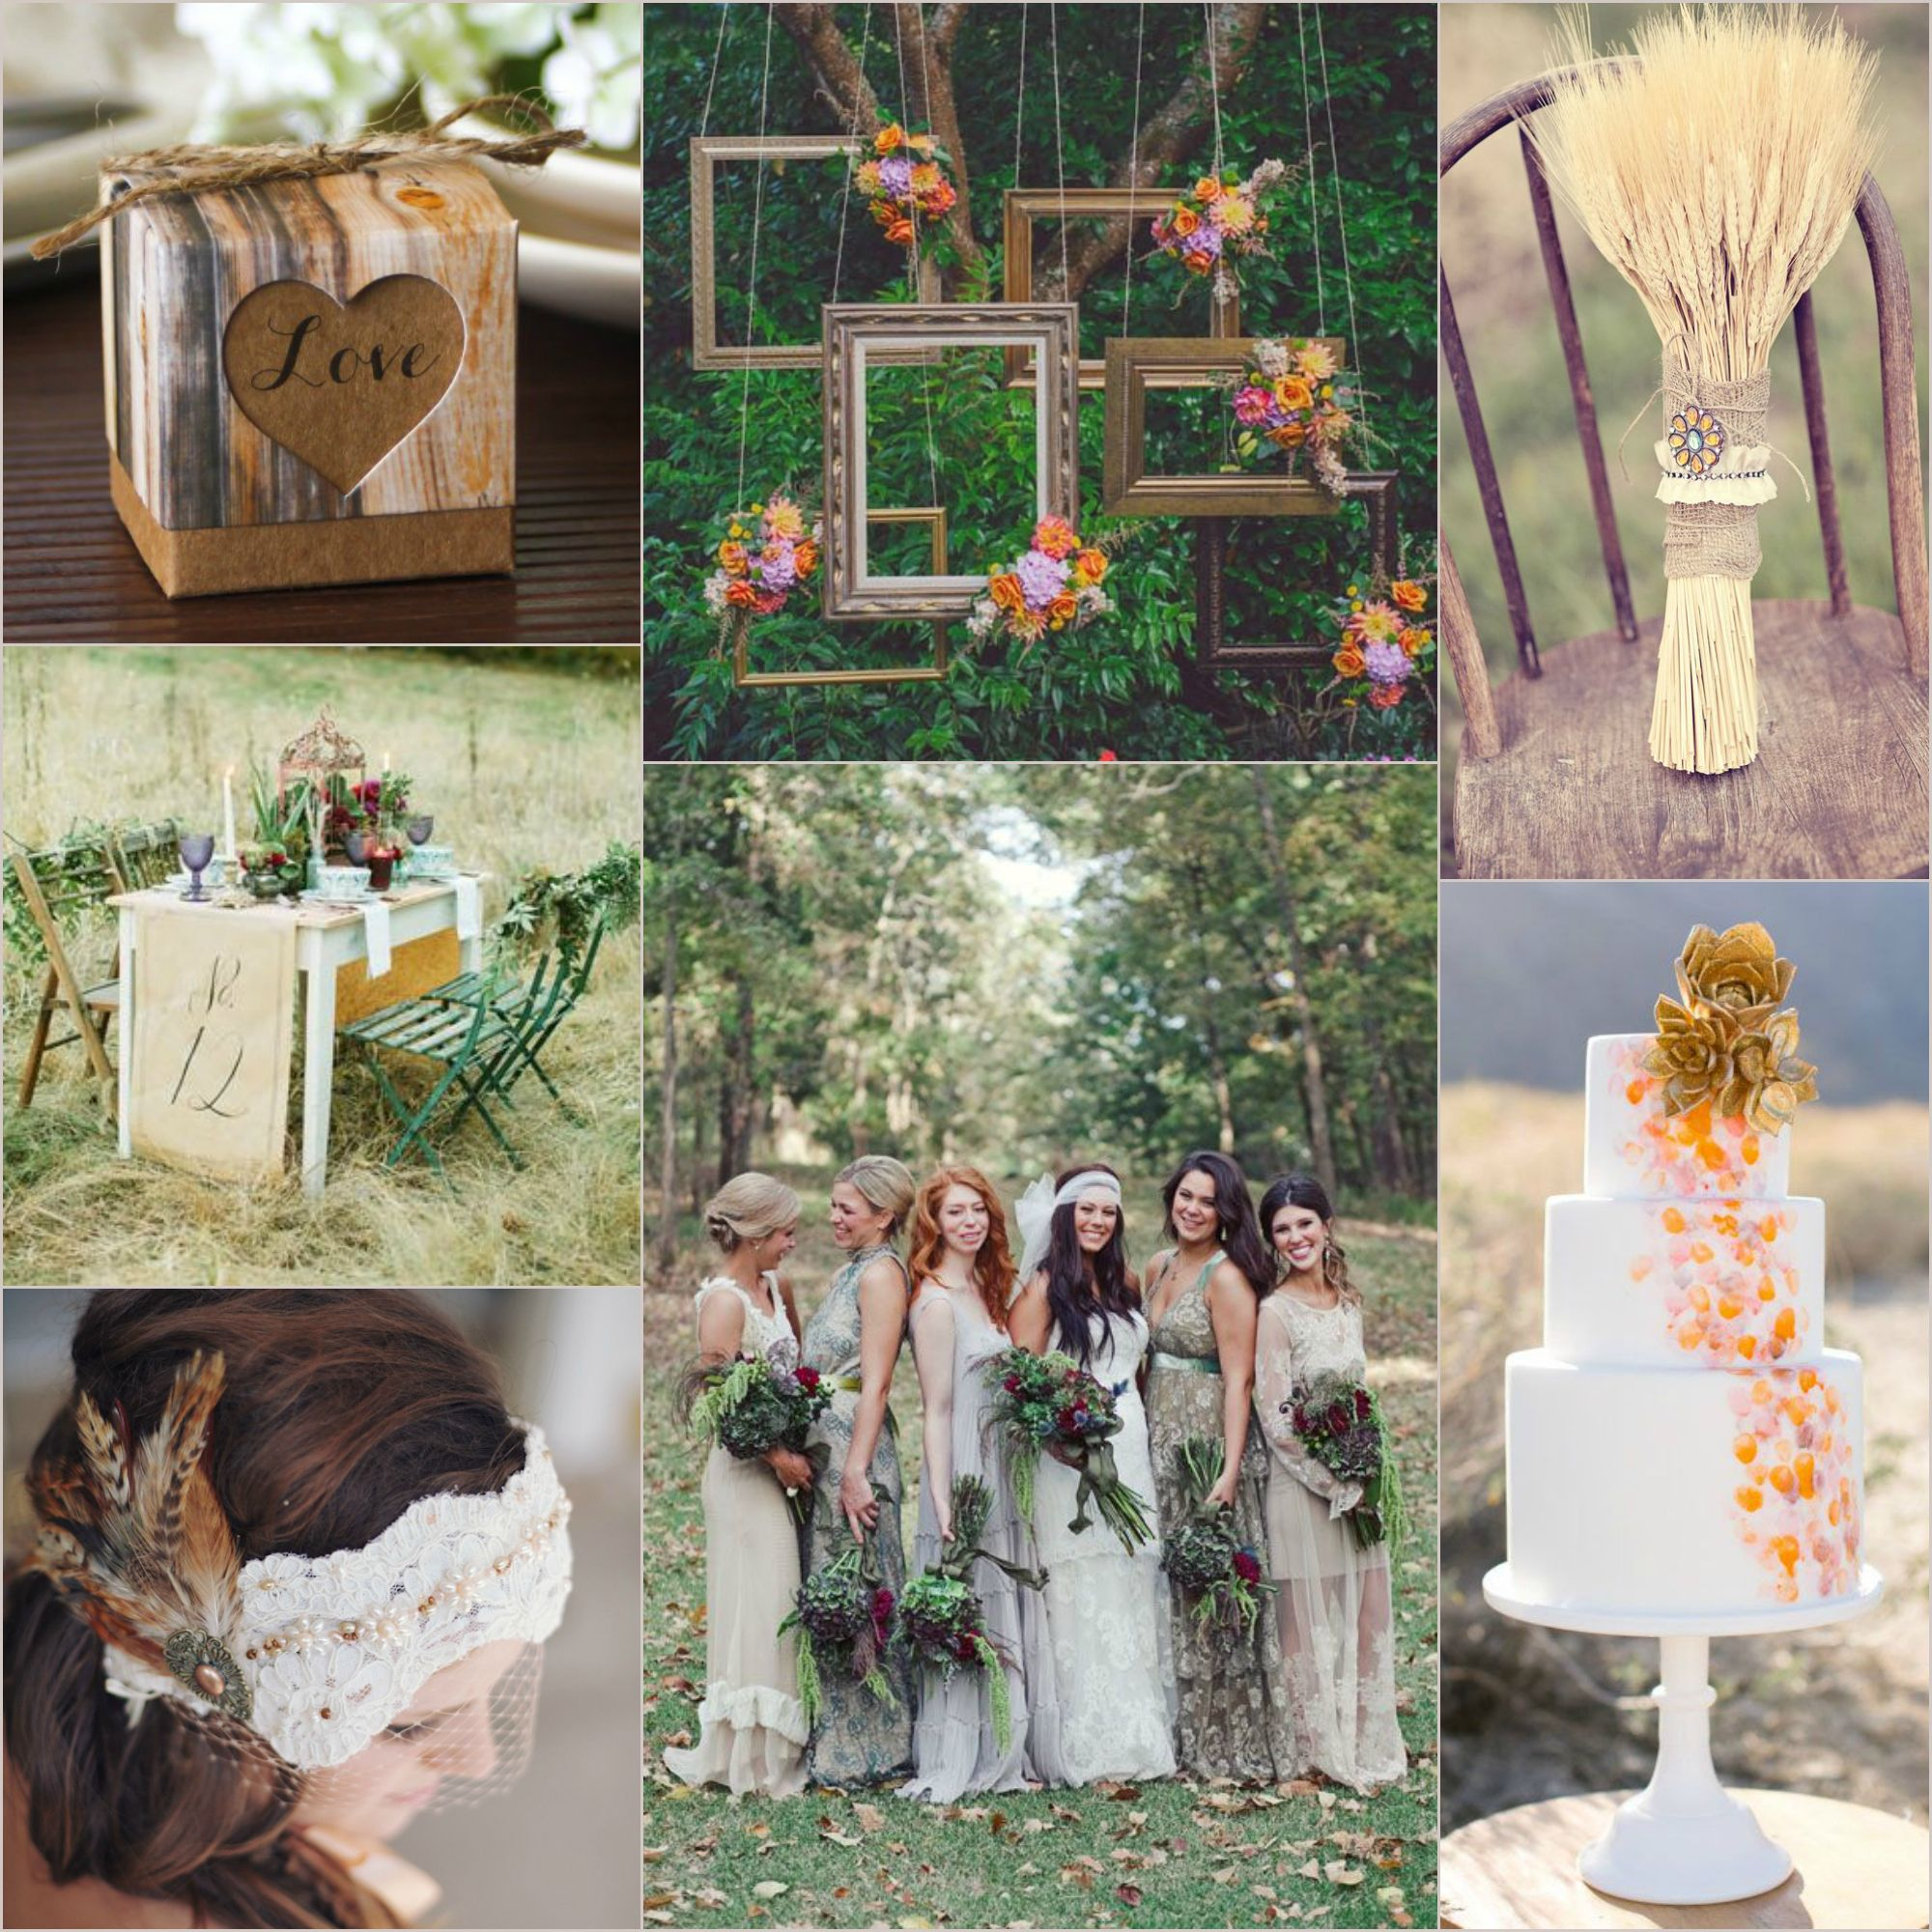 6 Hottest Wedding Ideas For 2014: Wedding Favors, Wedding Themes